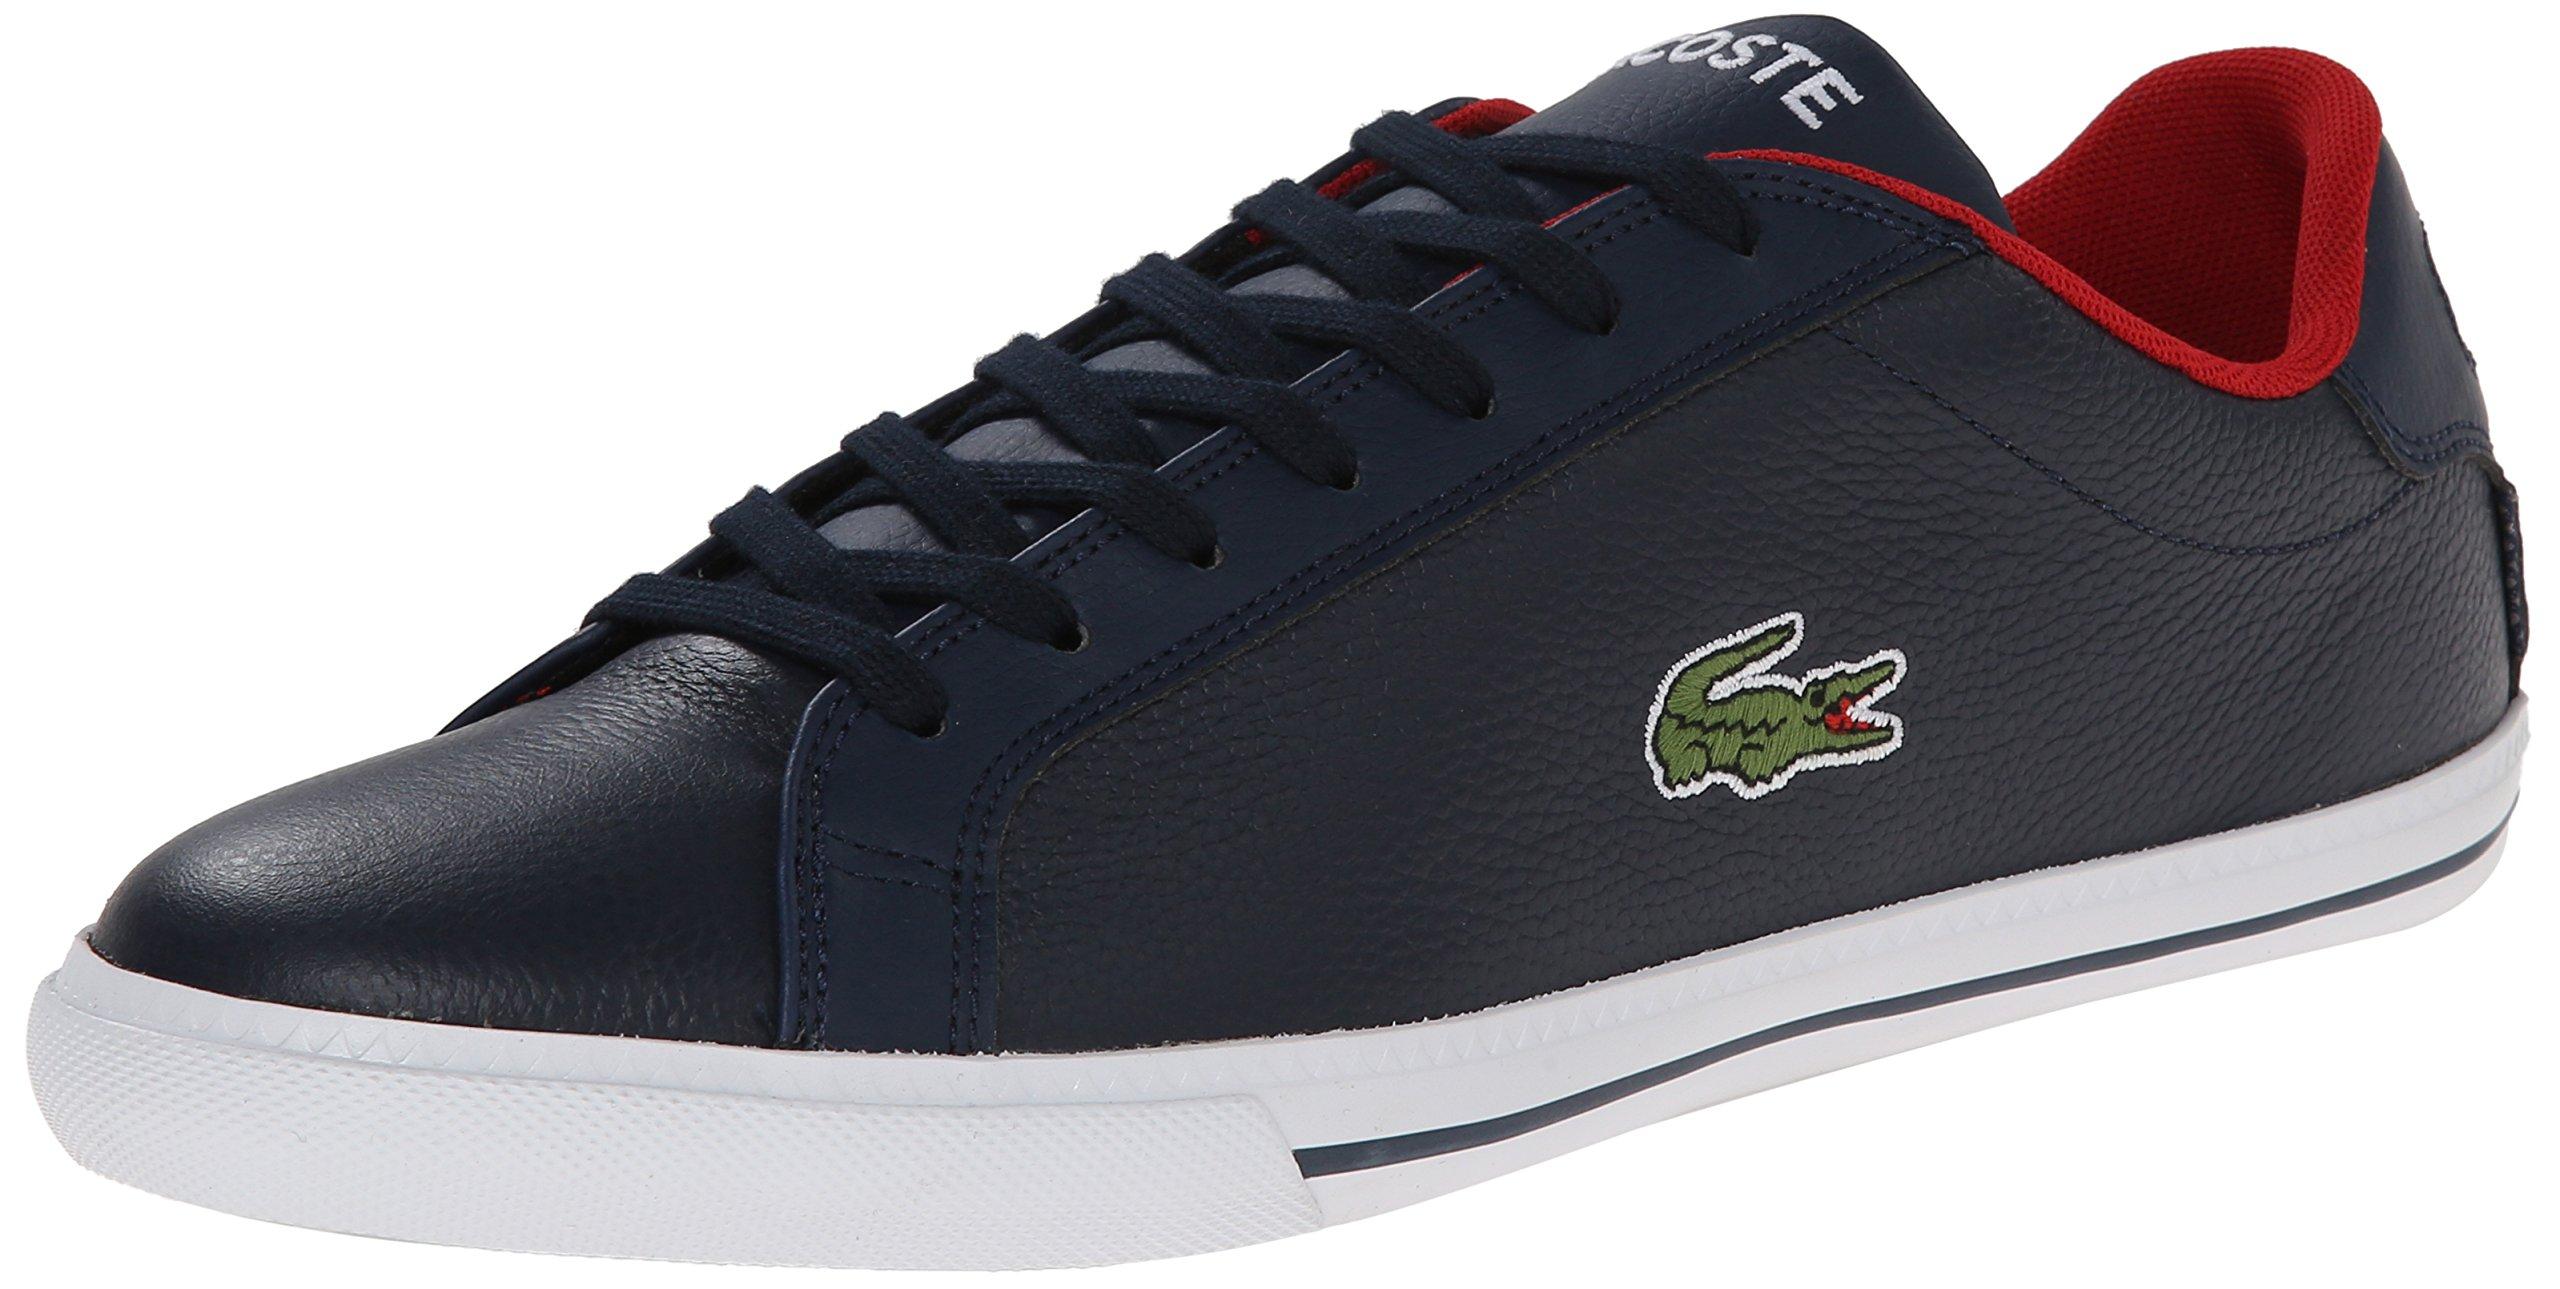 Lacoste Men's Grad Vulc Fashion Sneaker, Dark Blue/Red, 8.5 M US